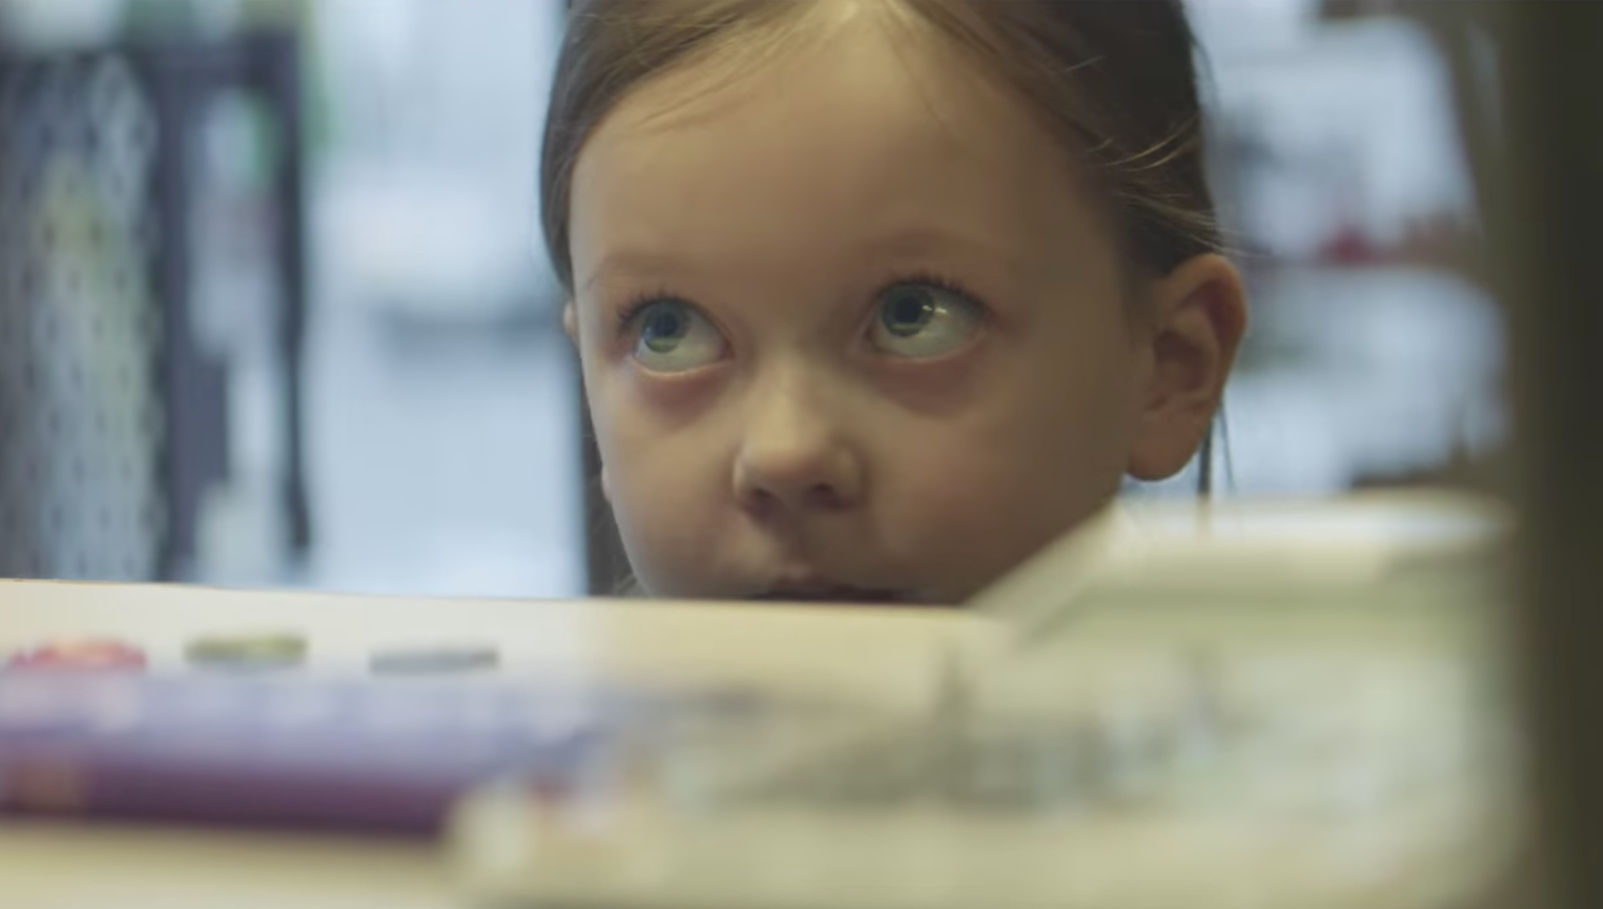 The Cadbury Mums Birthday Ad Philanthropy Claims Hard To Swallow